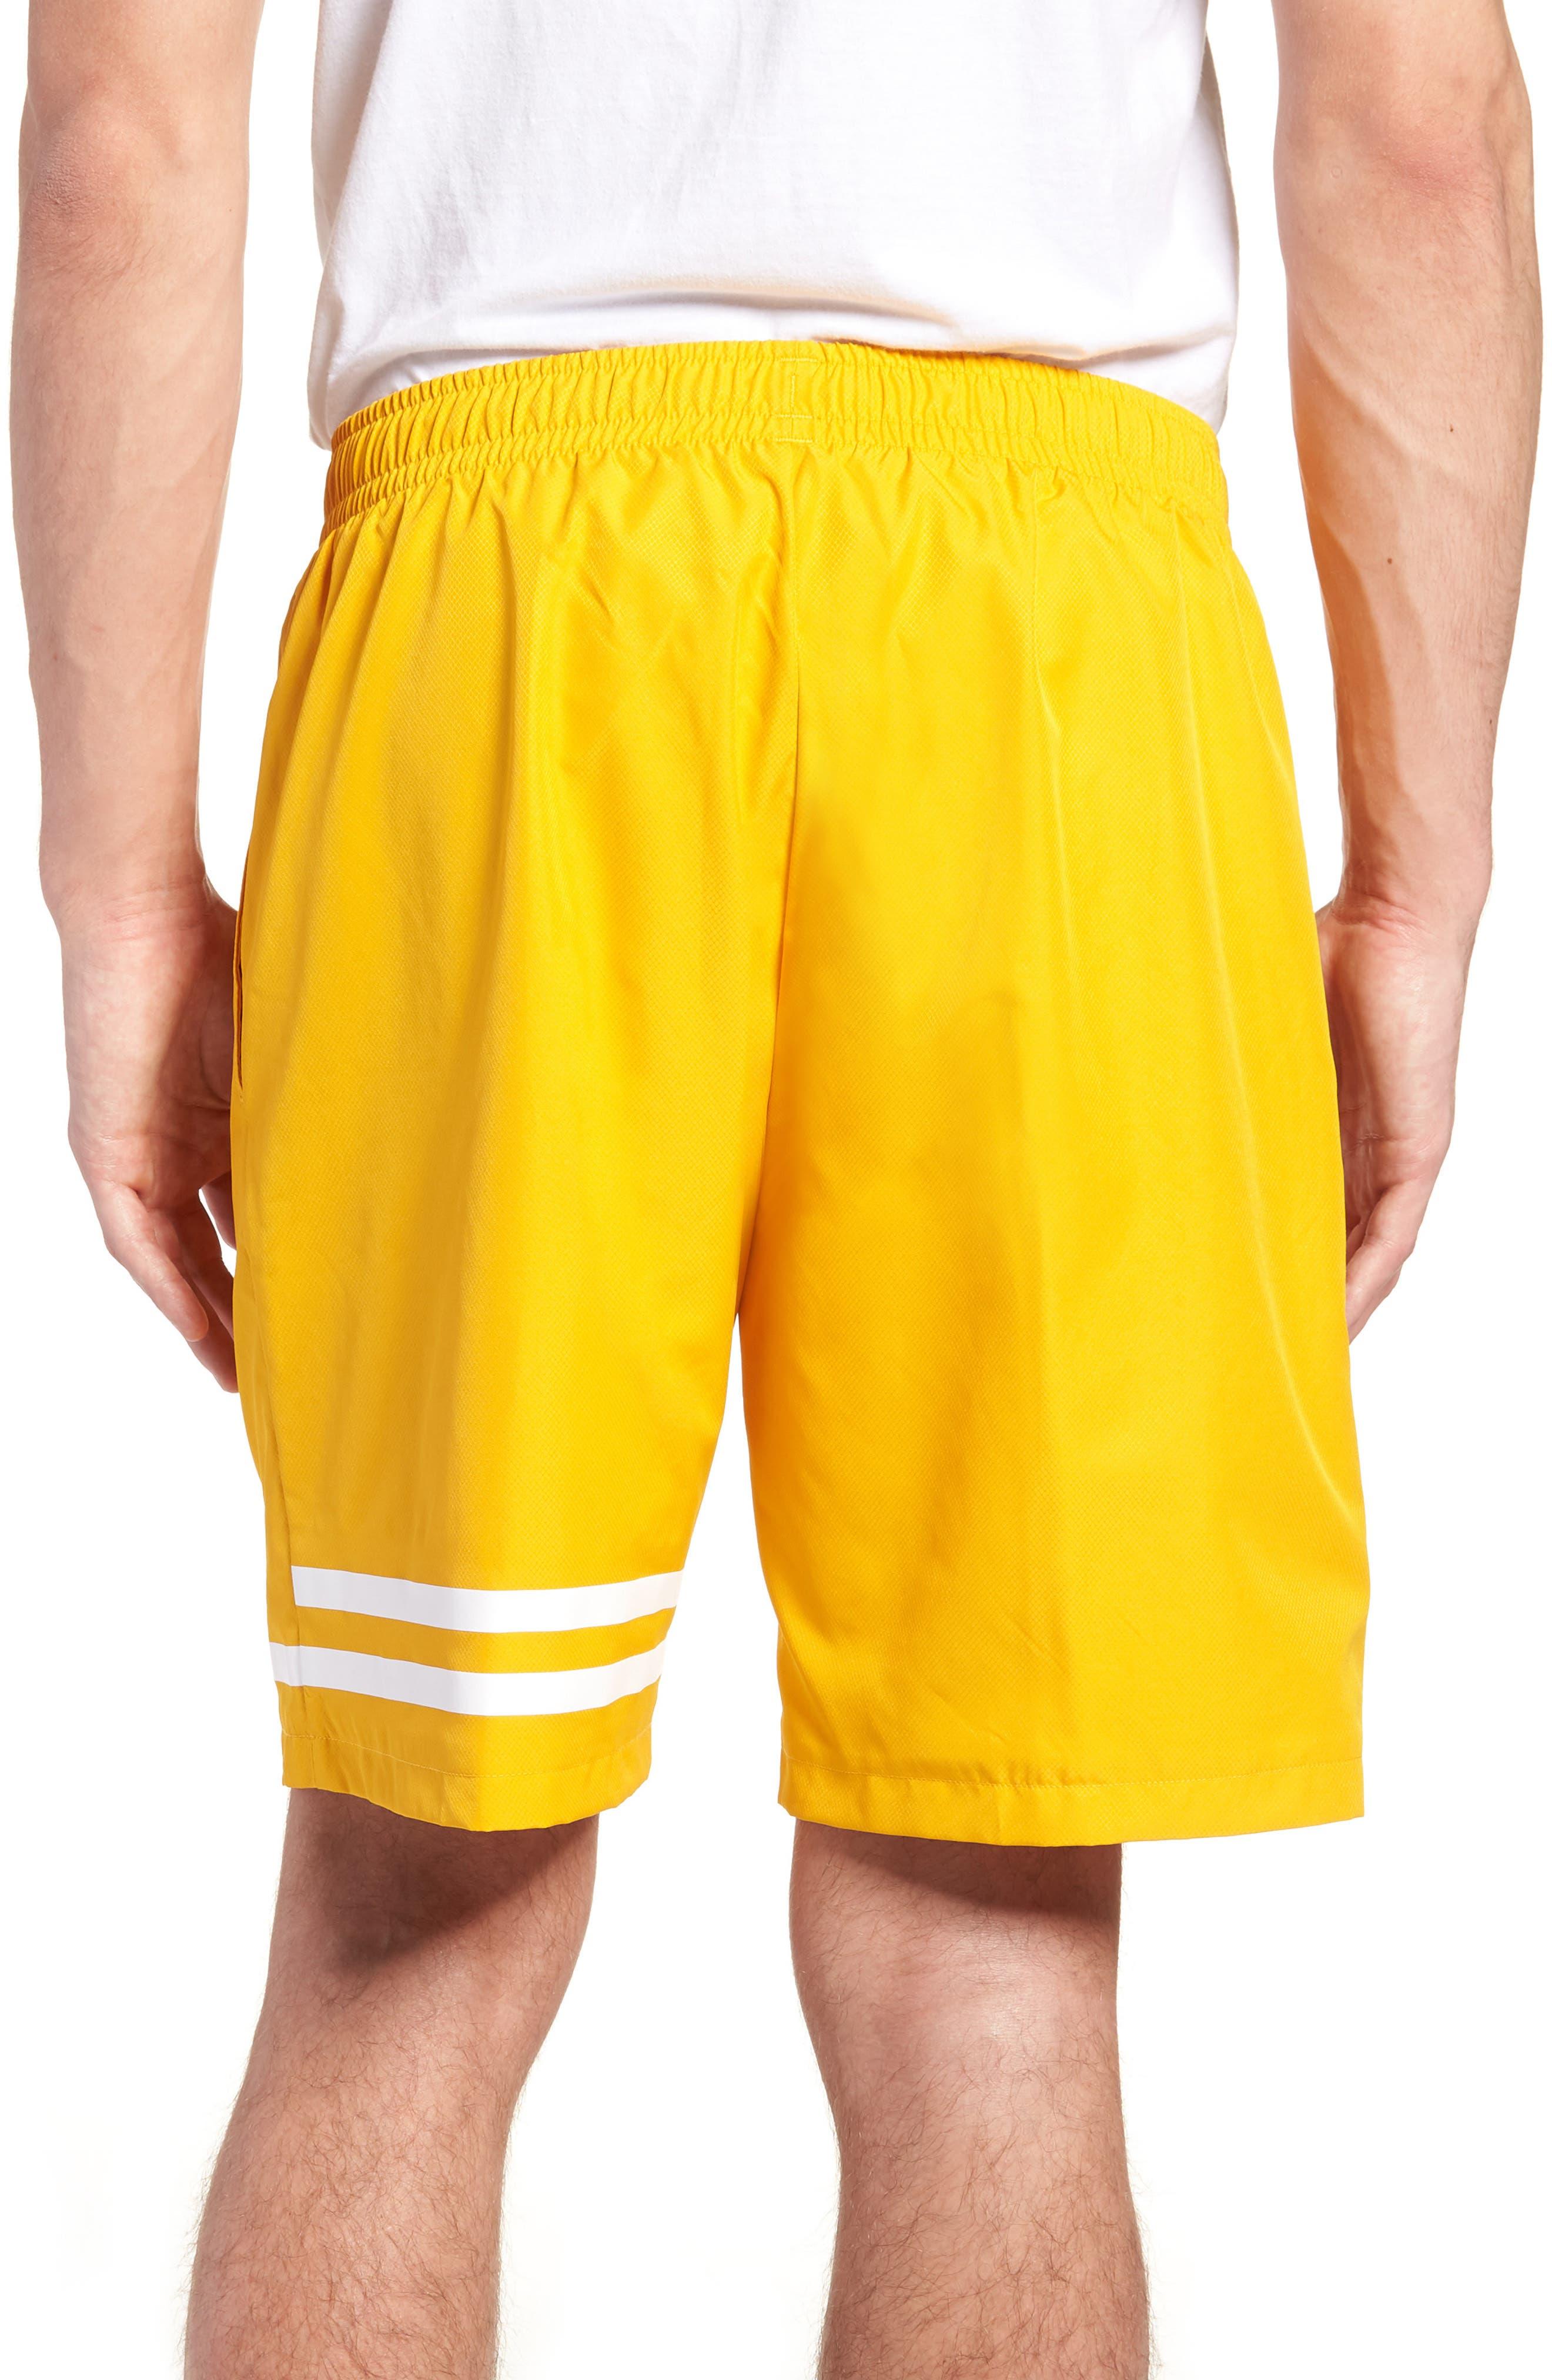 Stripe Shorts,                             Alternate thumbnail 2, color,                             Buttercup/ White